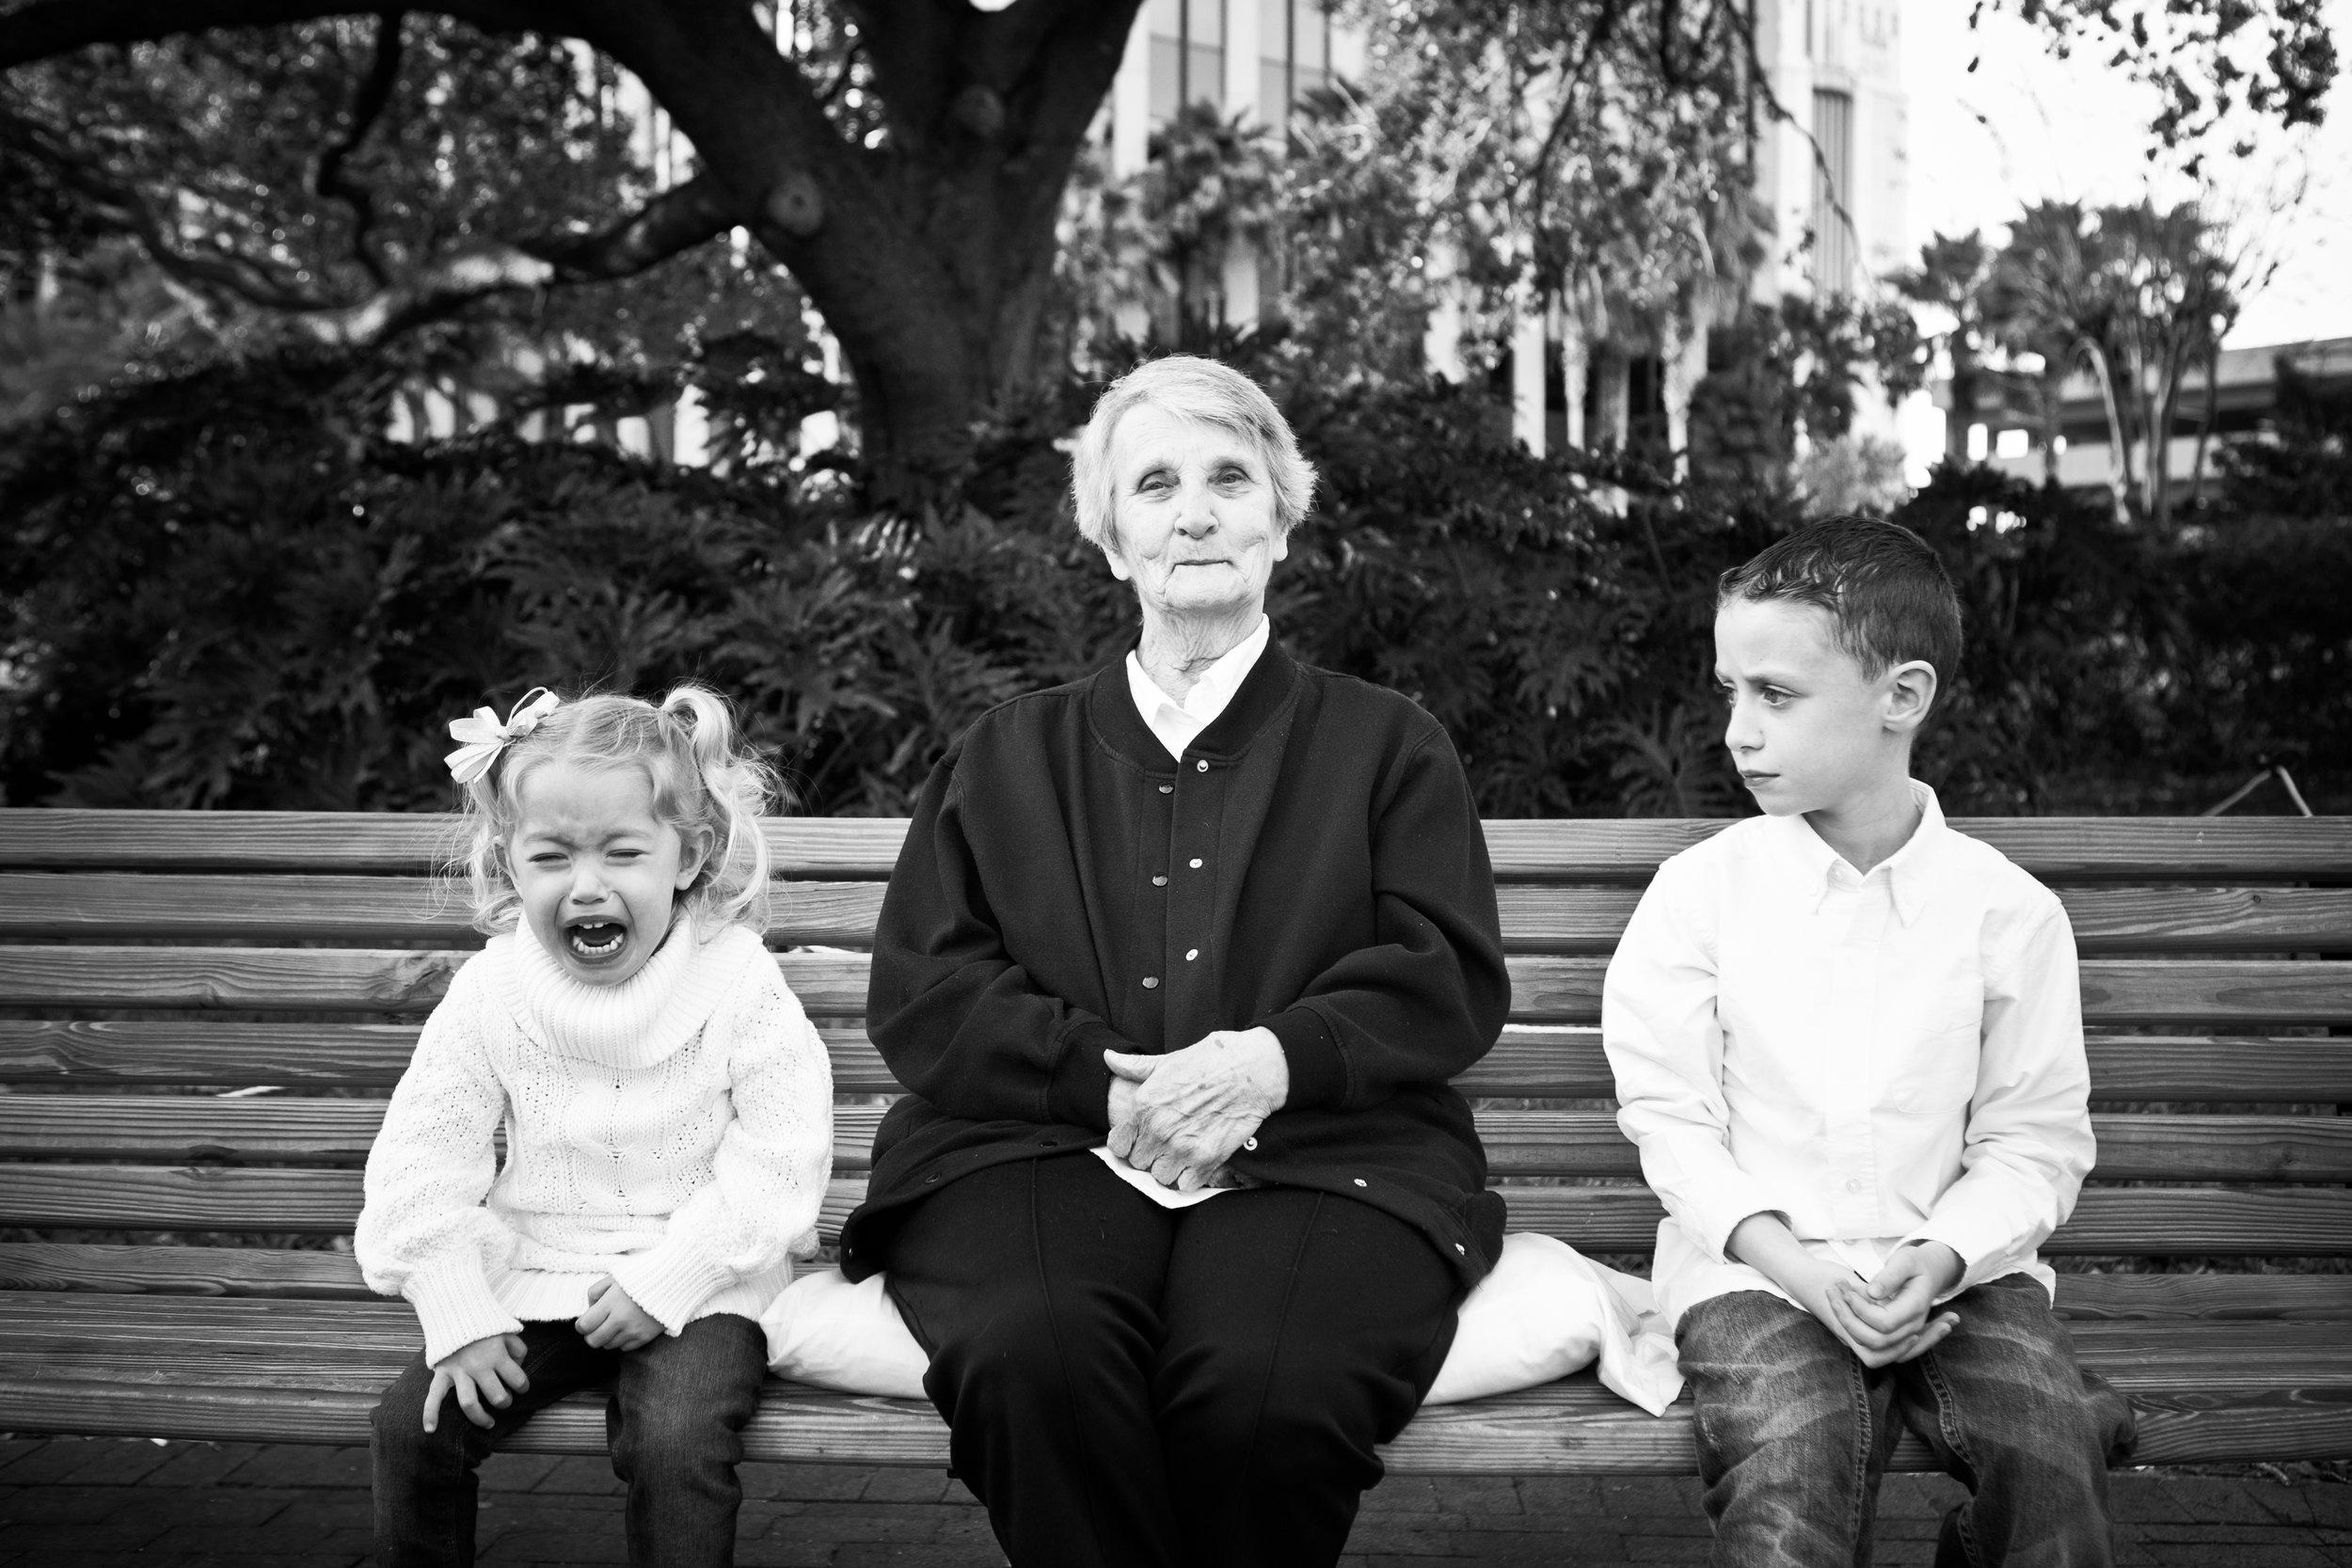 orlando-family-portrait-photographer--1.jpg